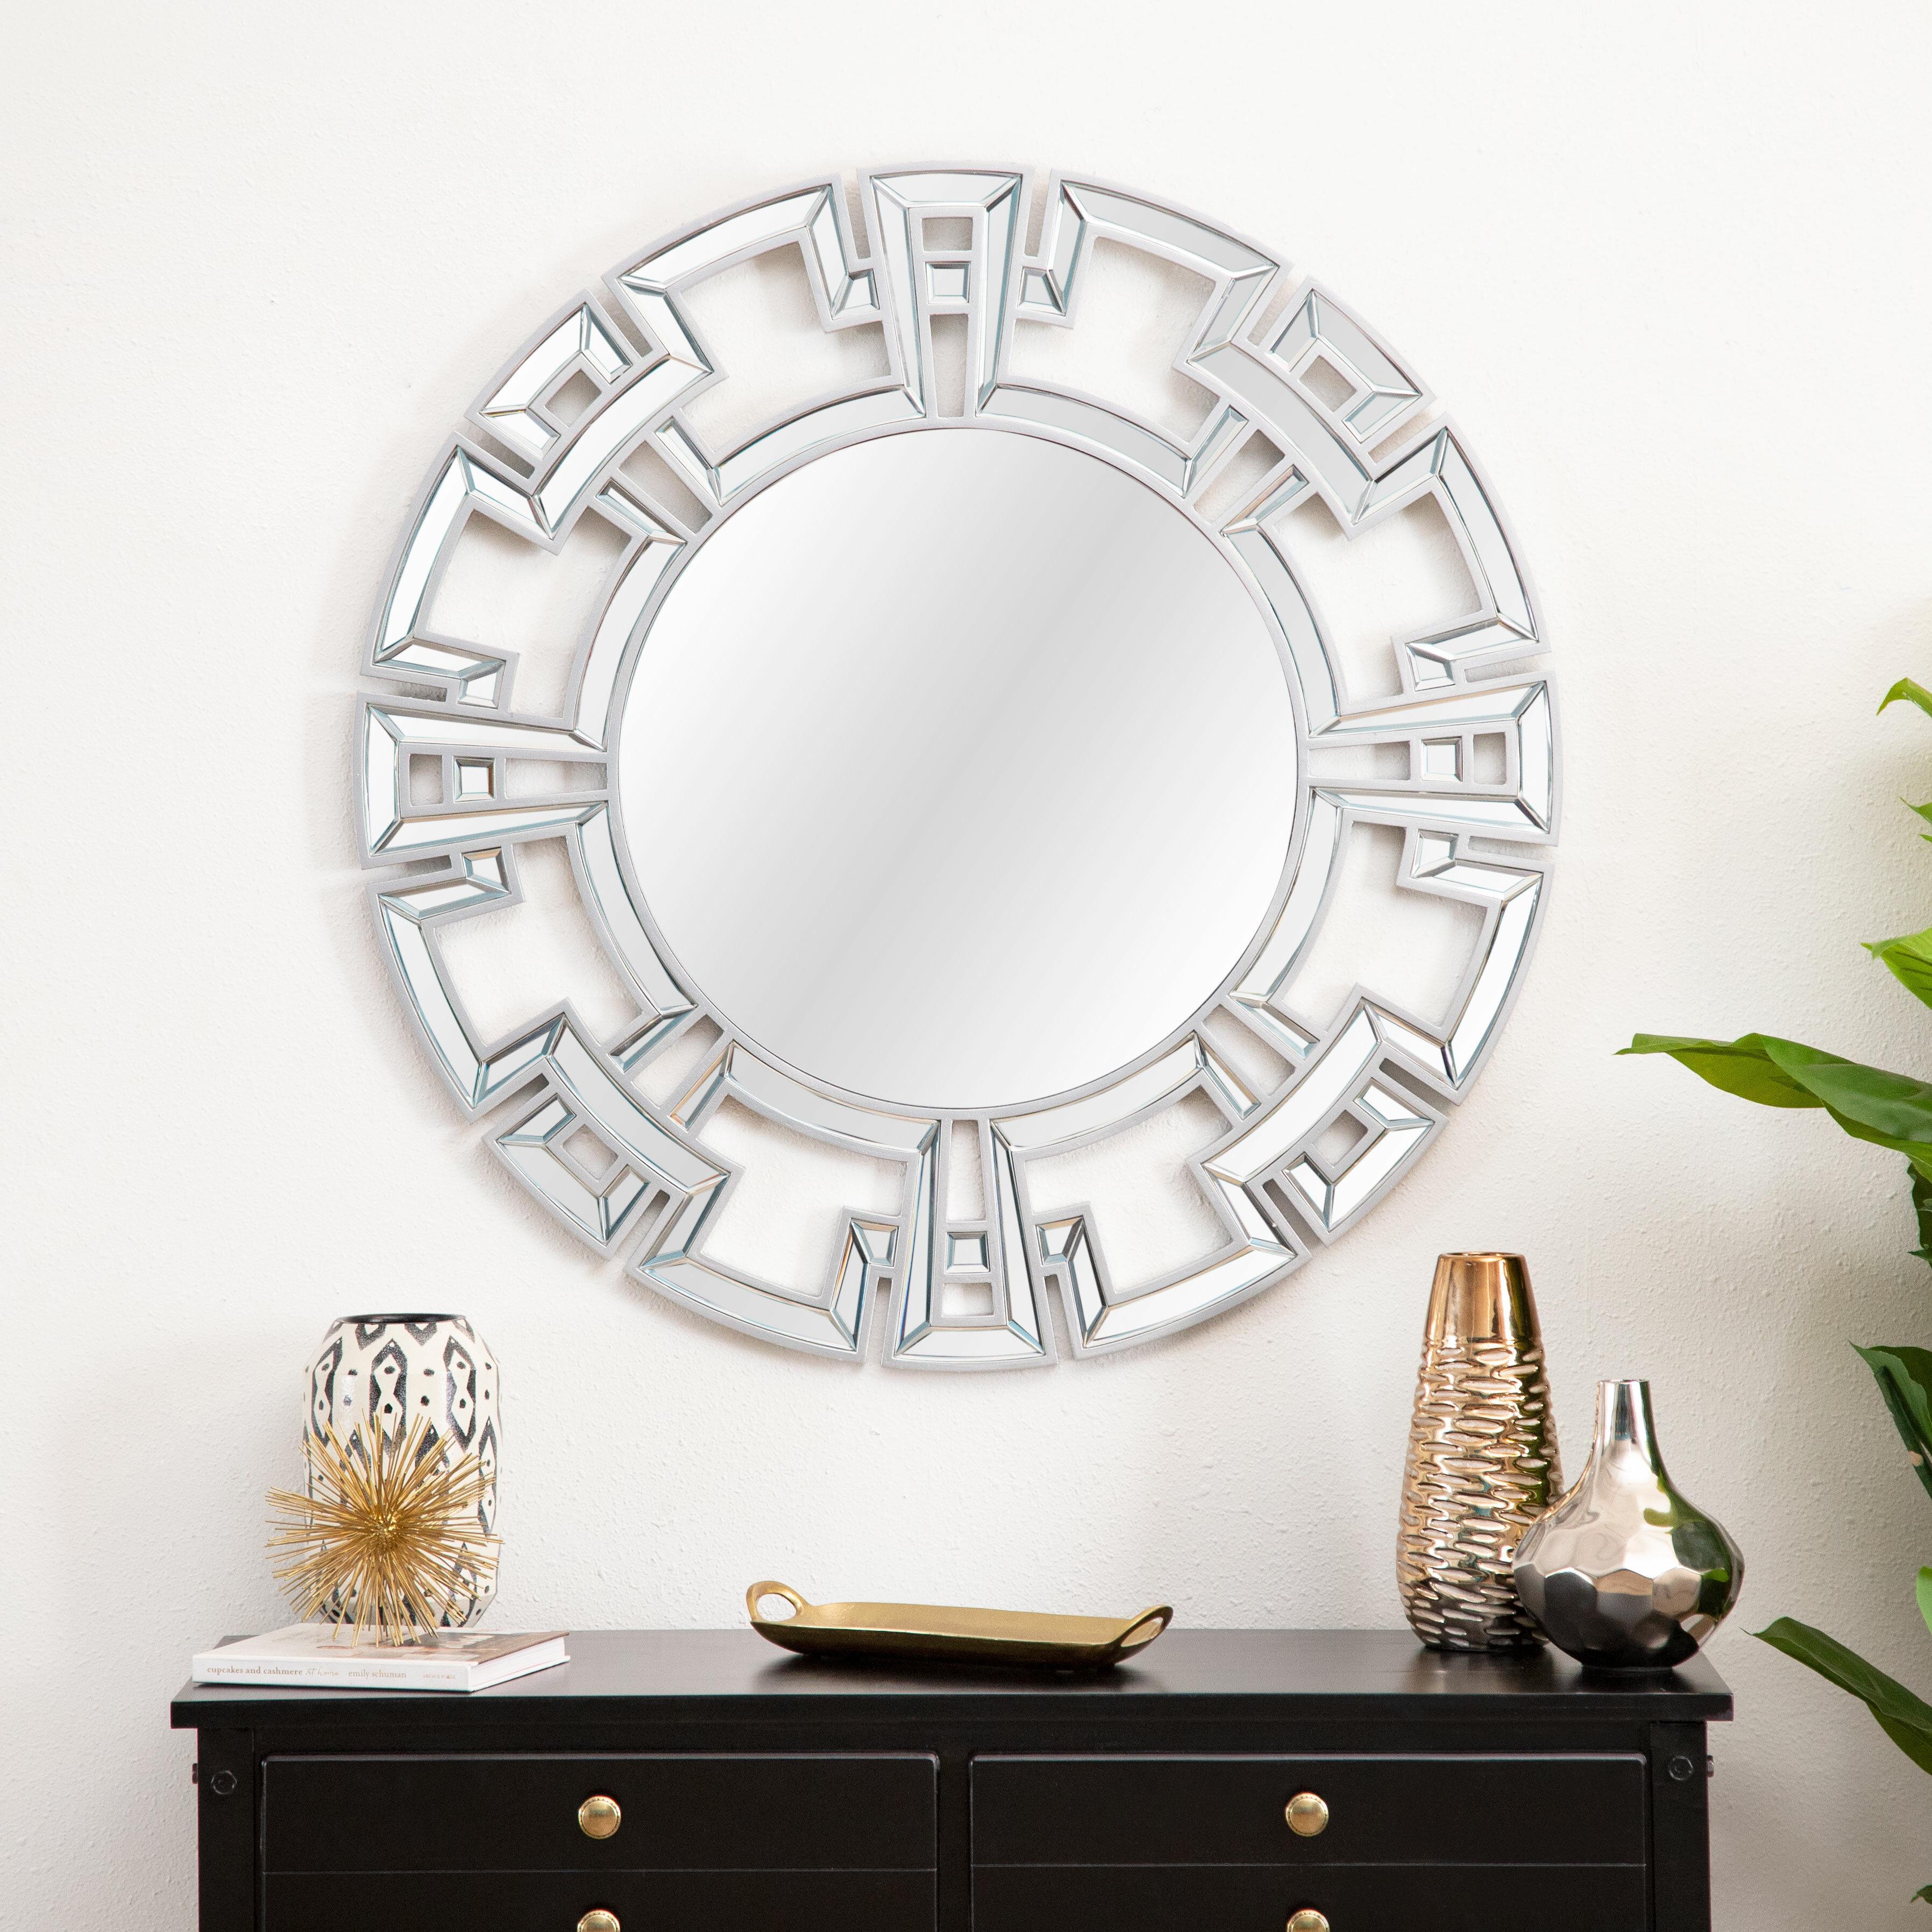 Willa Arlo Interiors Tata Openwork Round Wall Mirror With Regard To Dandre Wall Mirrors (View 4 of 20)